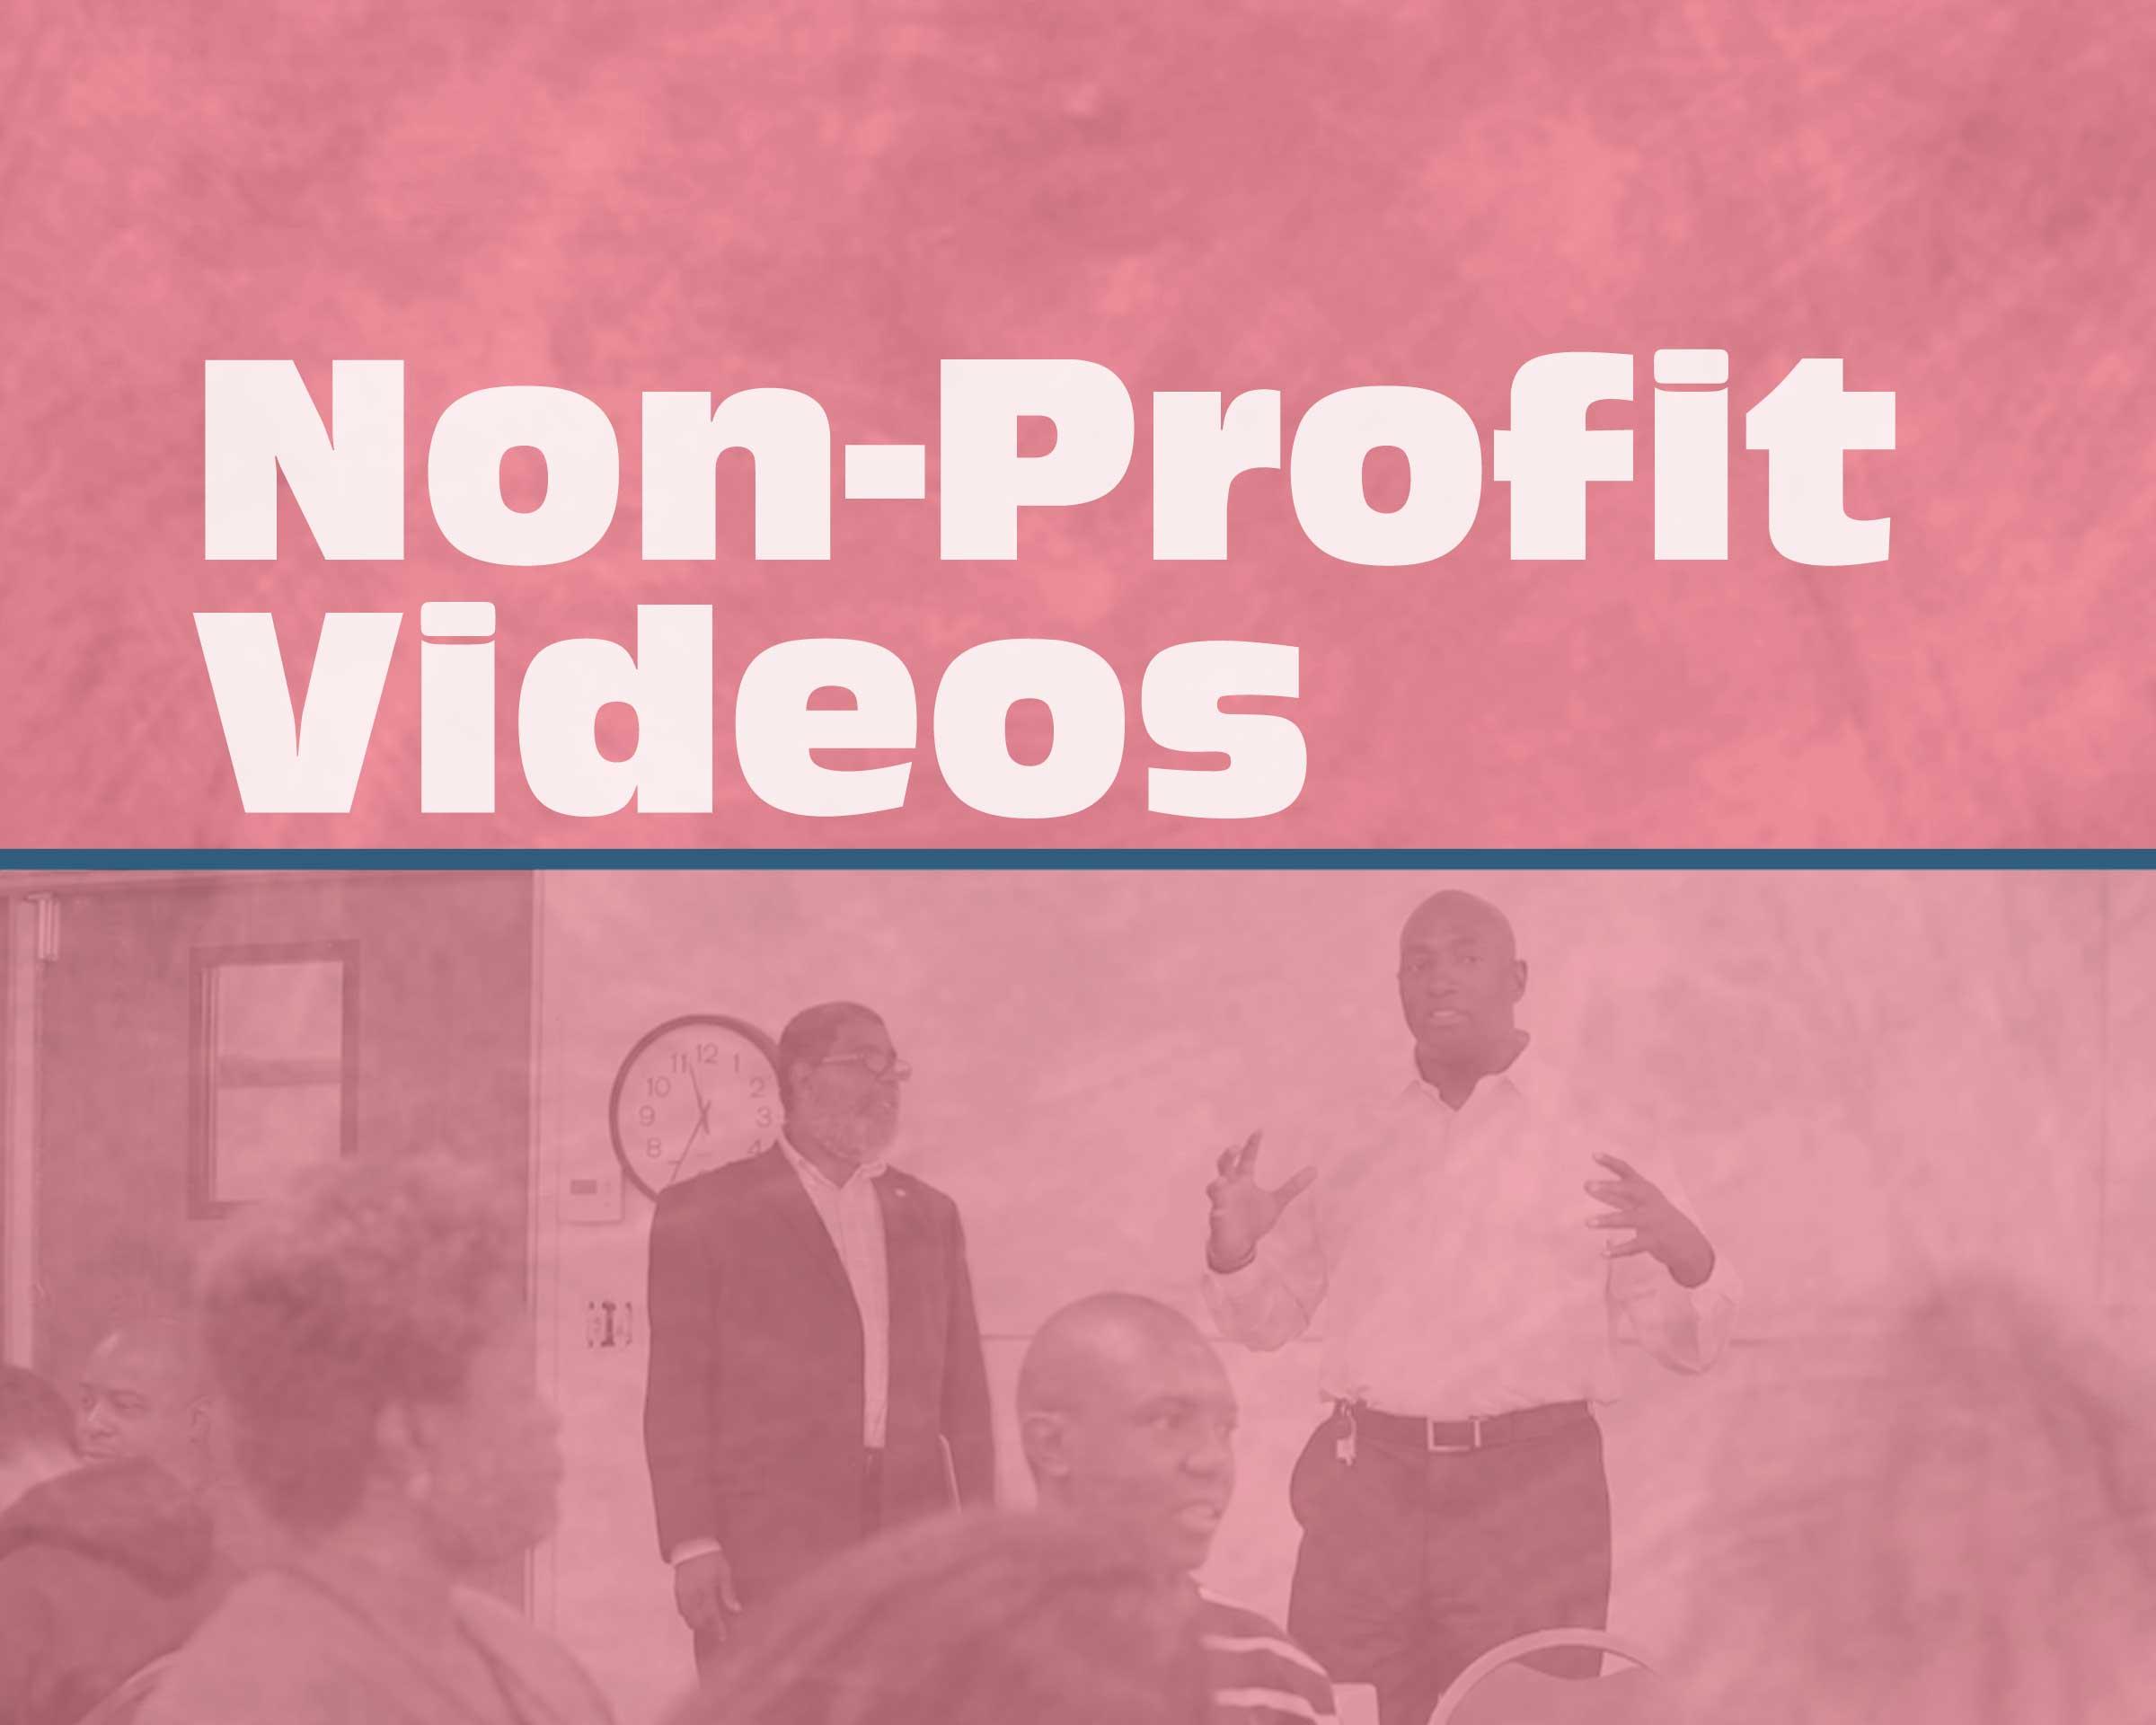 Non-Profit Videos